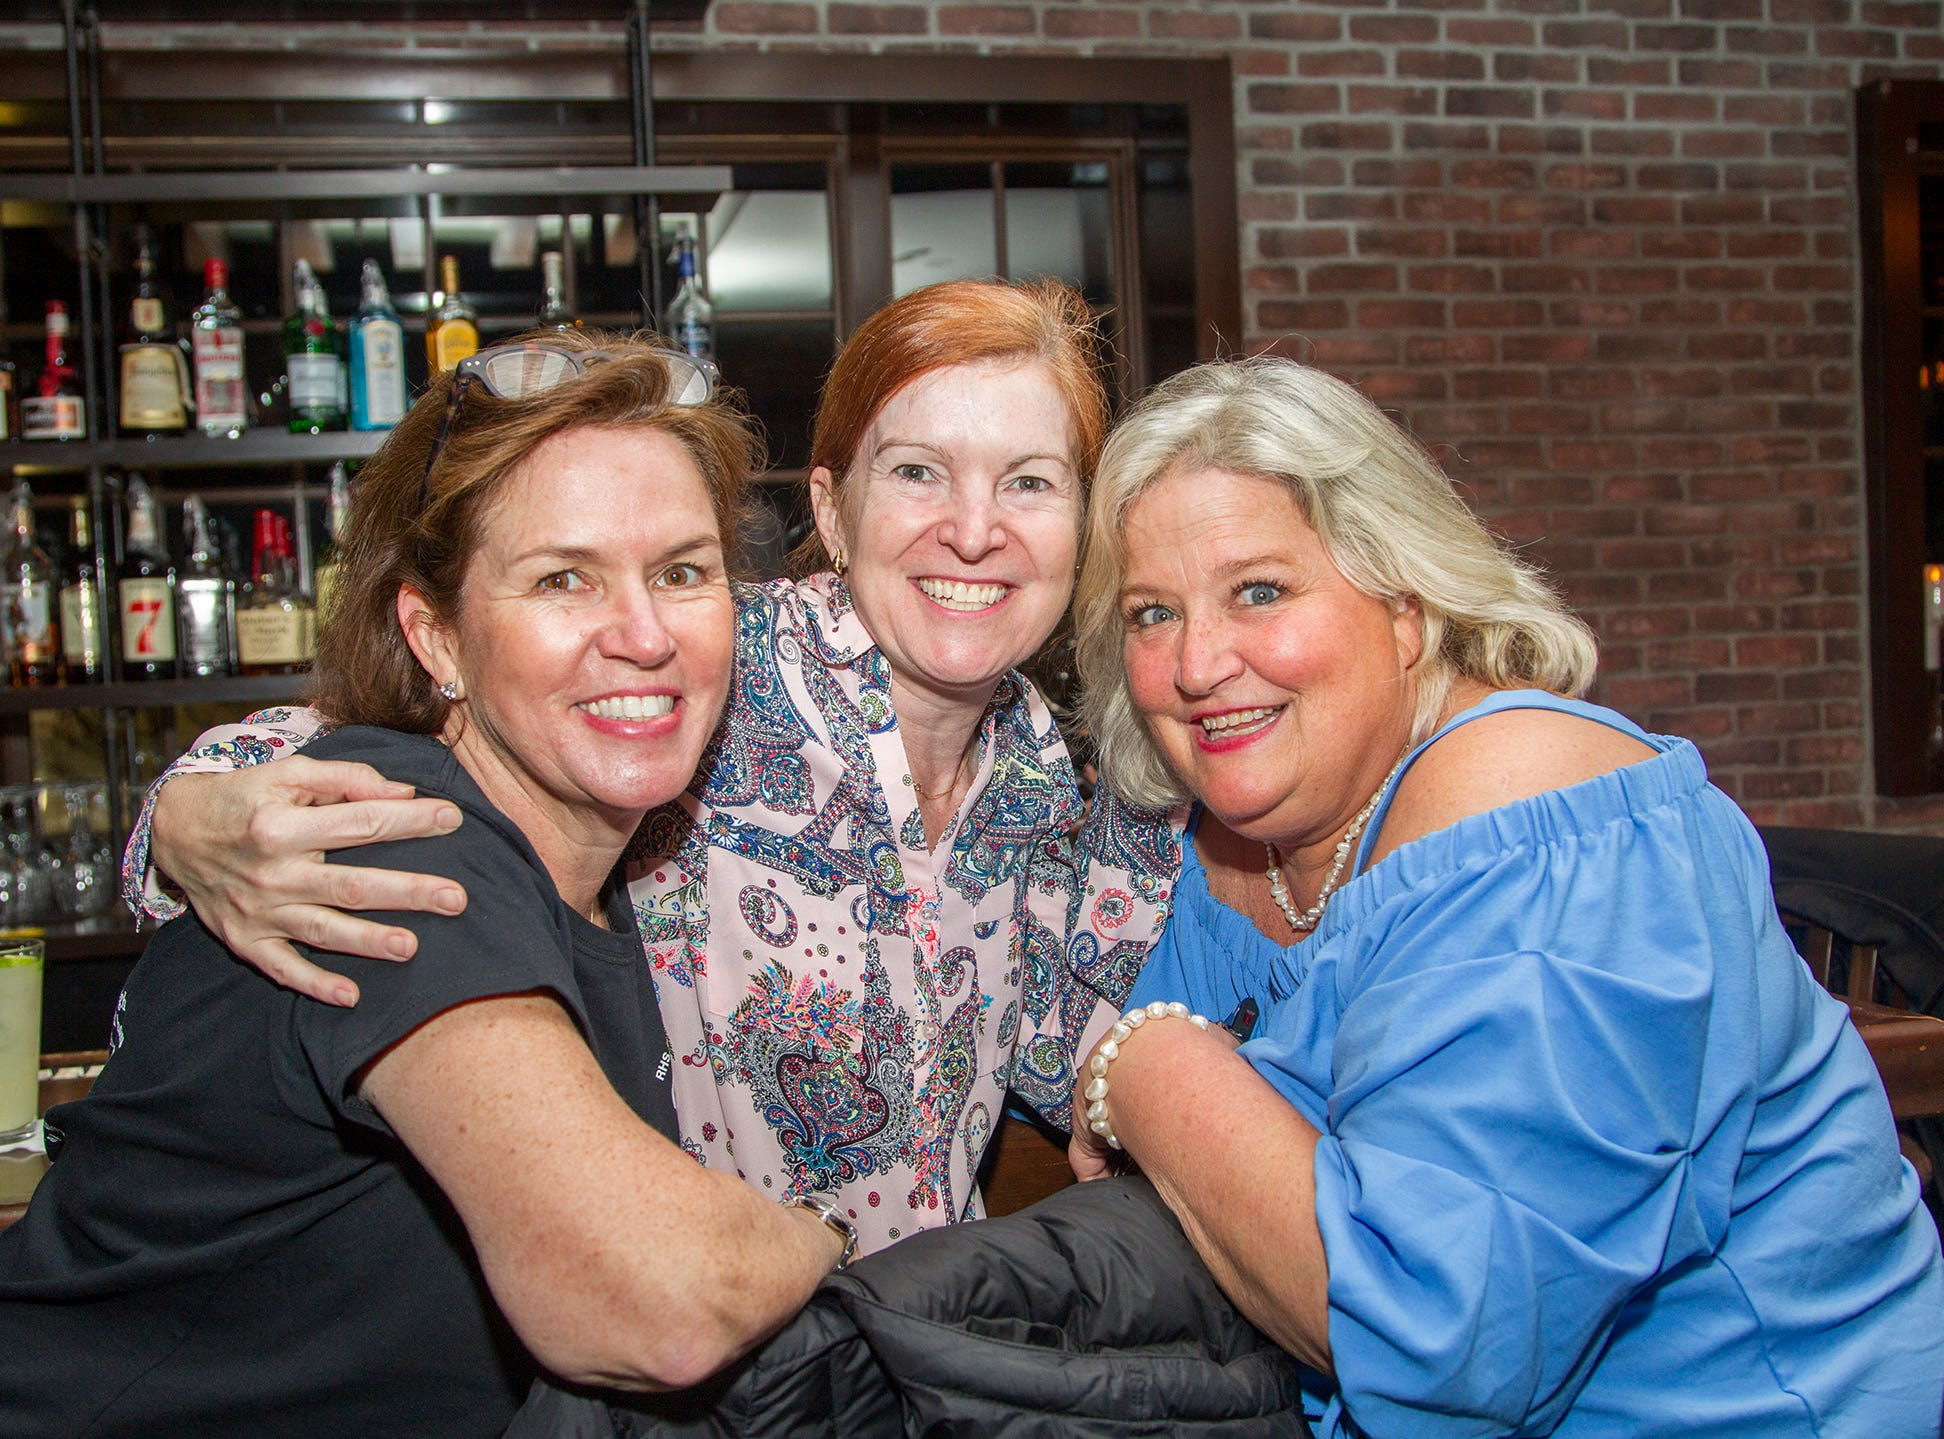 Gail MC Carthy, Meghan Bracken, Leigh Warren. Ridgewood High School 2019 Jamboree after party at Park West Loft in Ridgewood.  2/9/2019